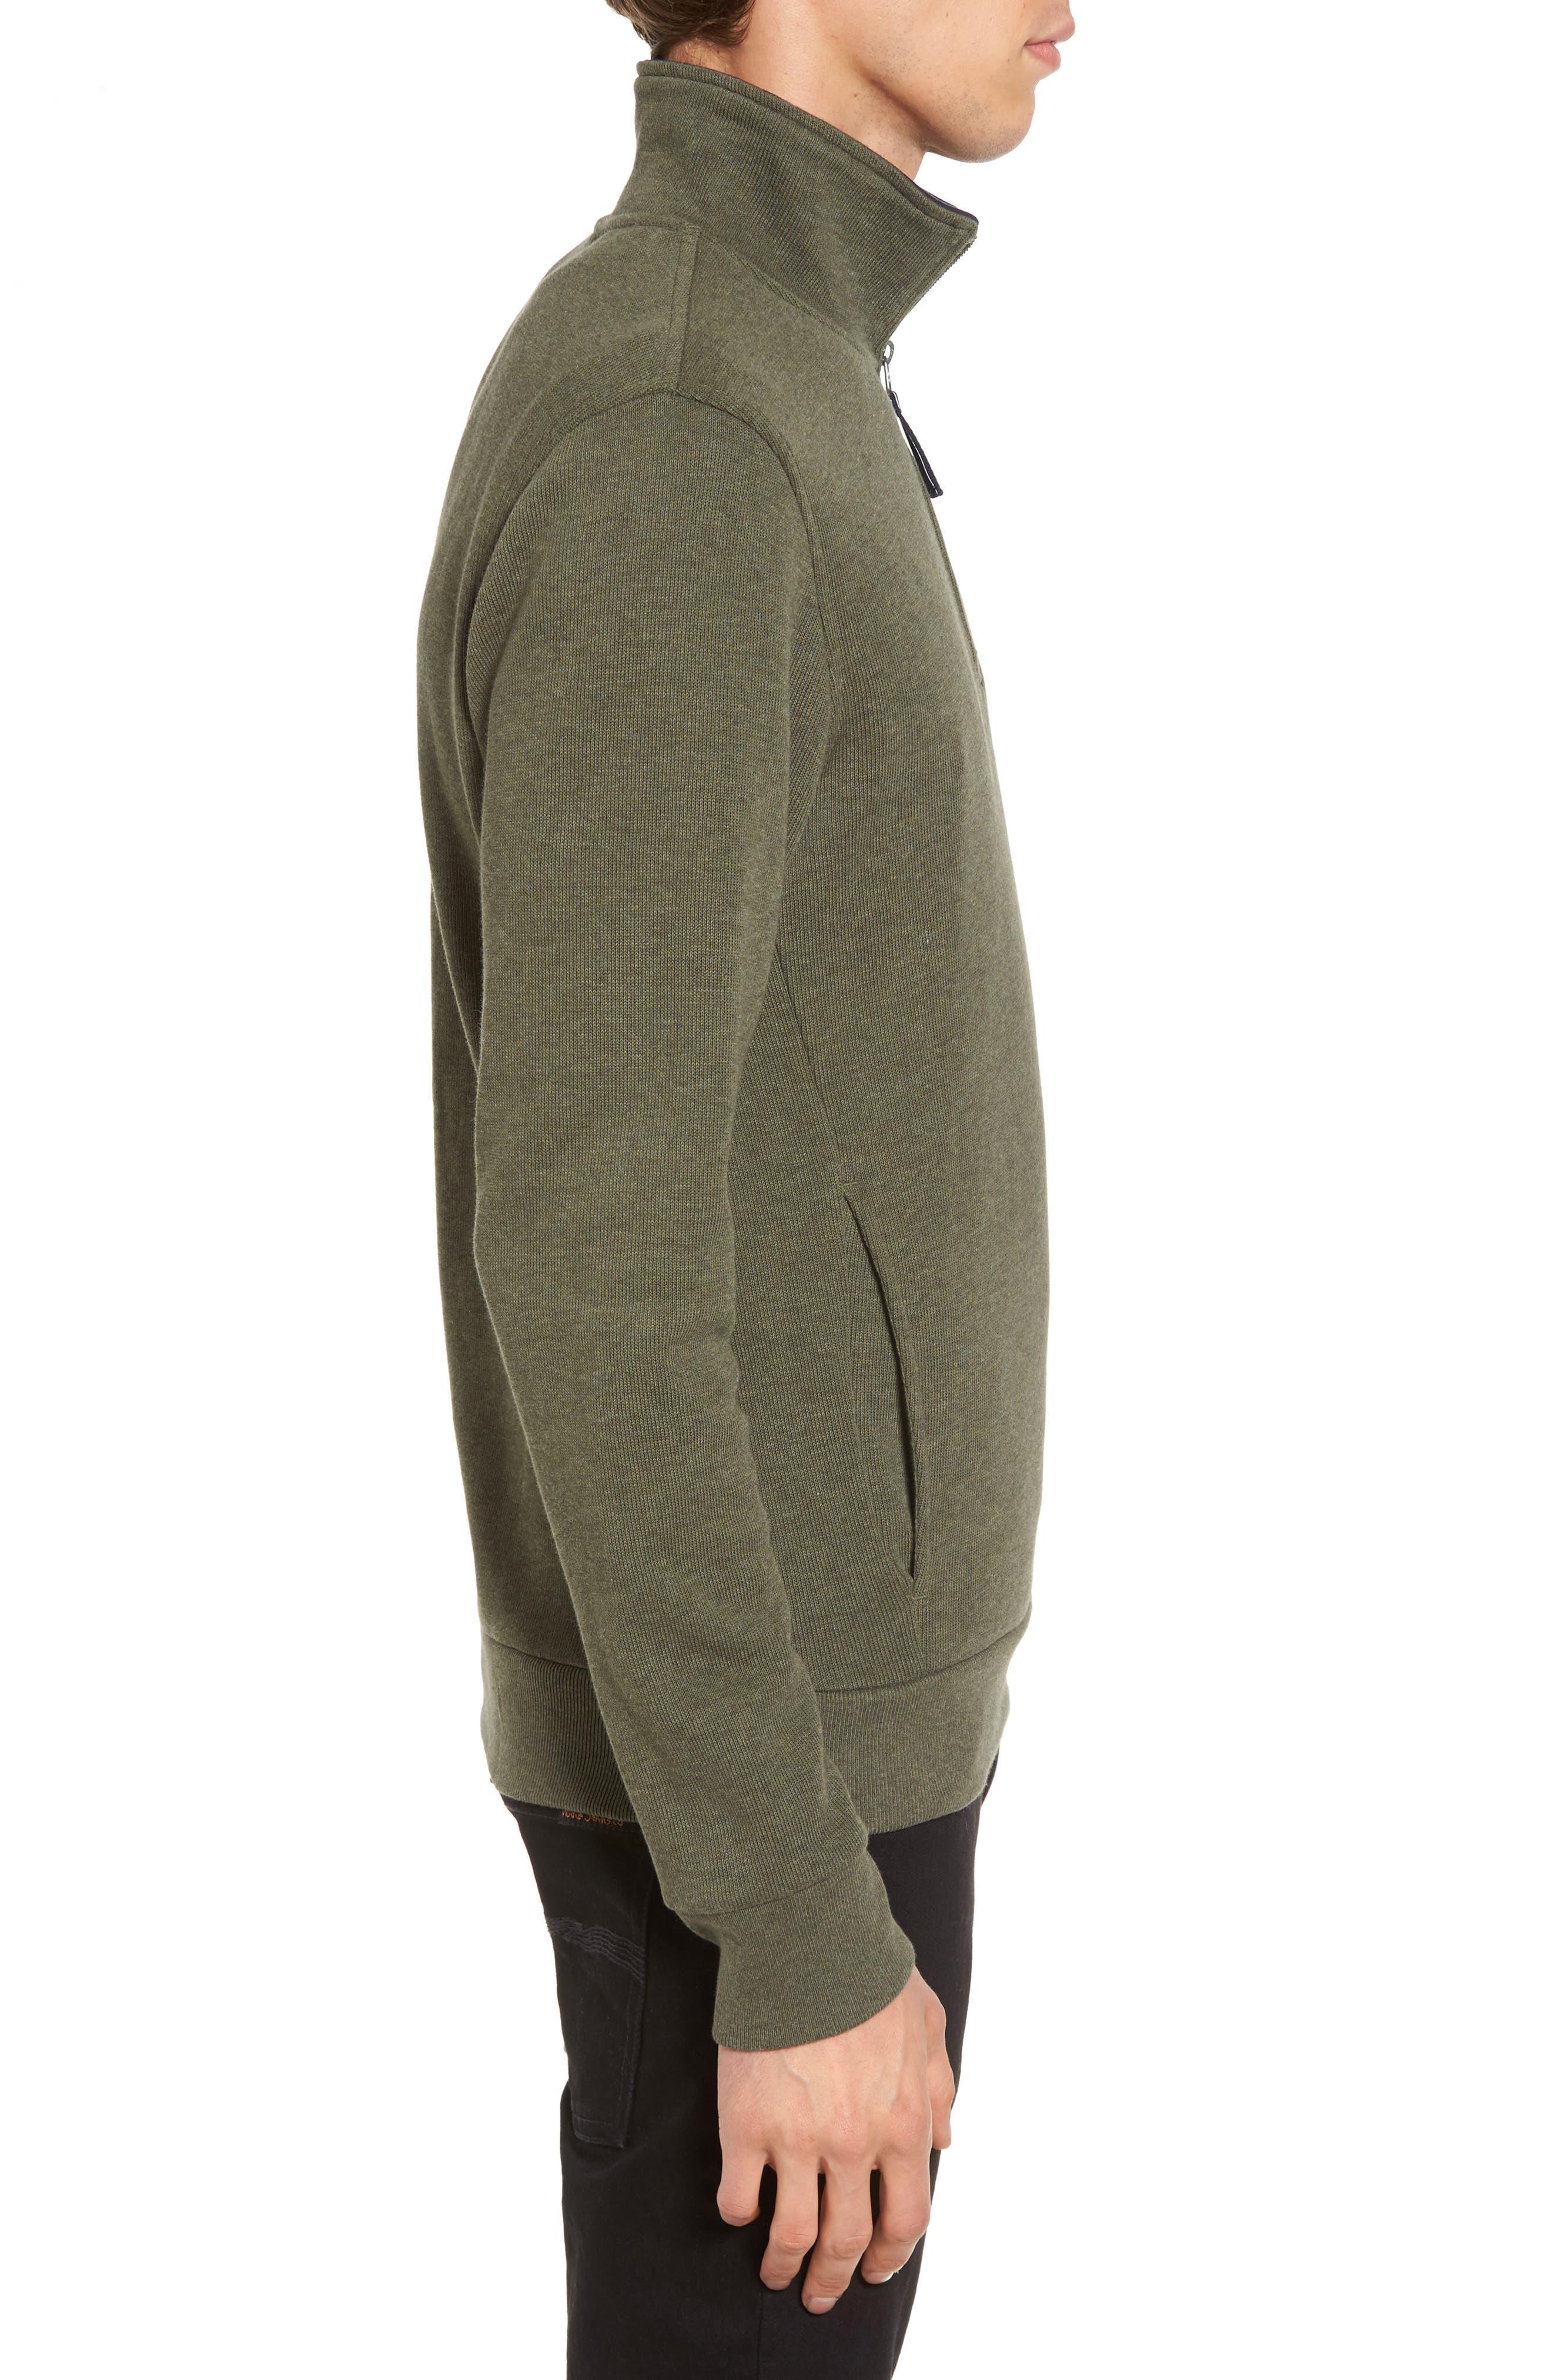 Quarter Zip Sweatshirt,                             Alternate thumbnail 3, color,                             2Qh Army/ Navy Blue